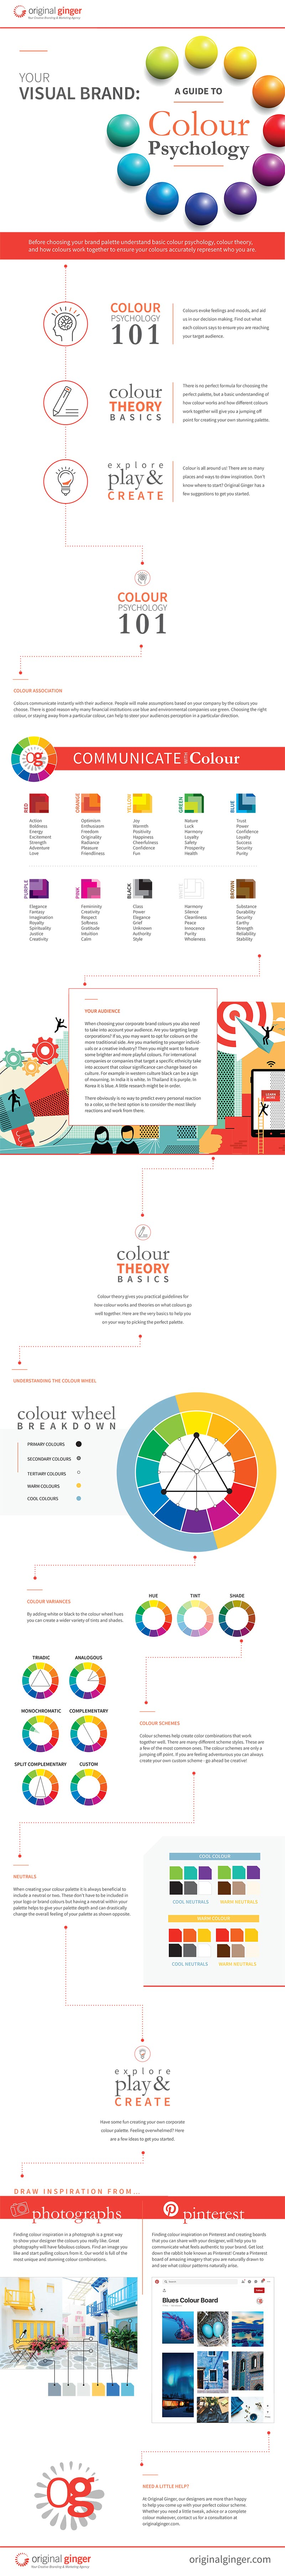 Original Ginger's Colour Psychology Infographic